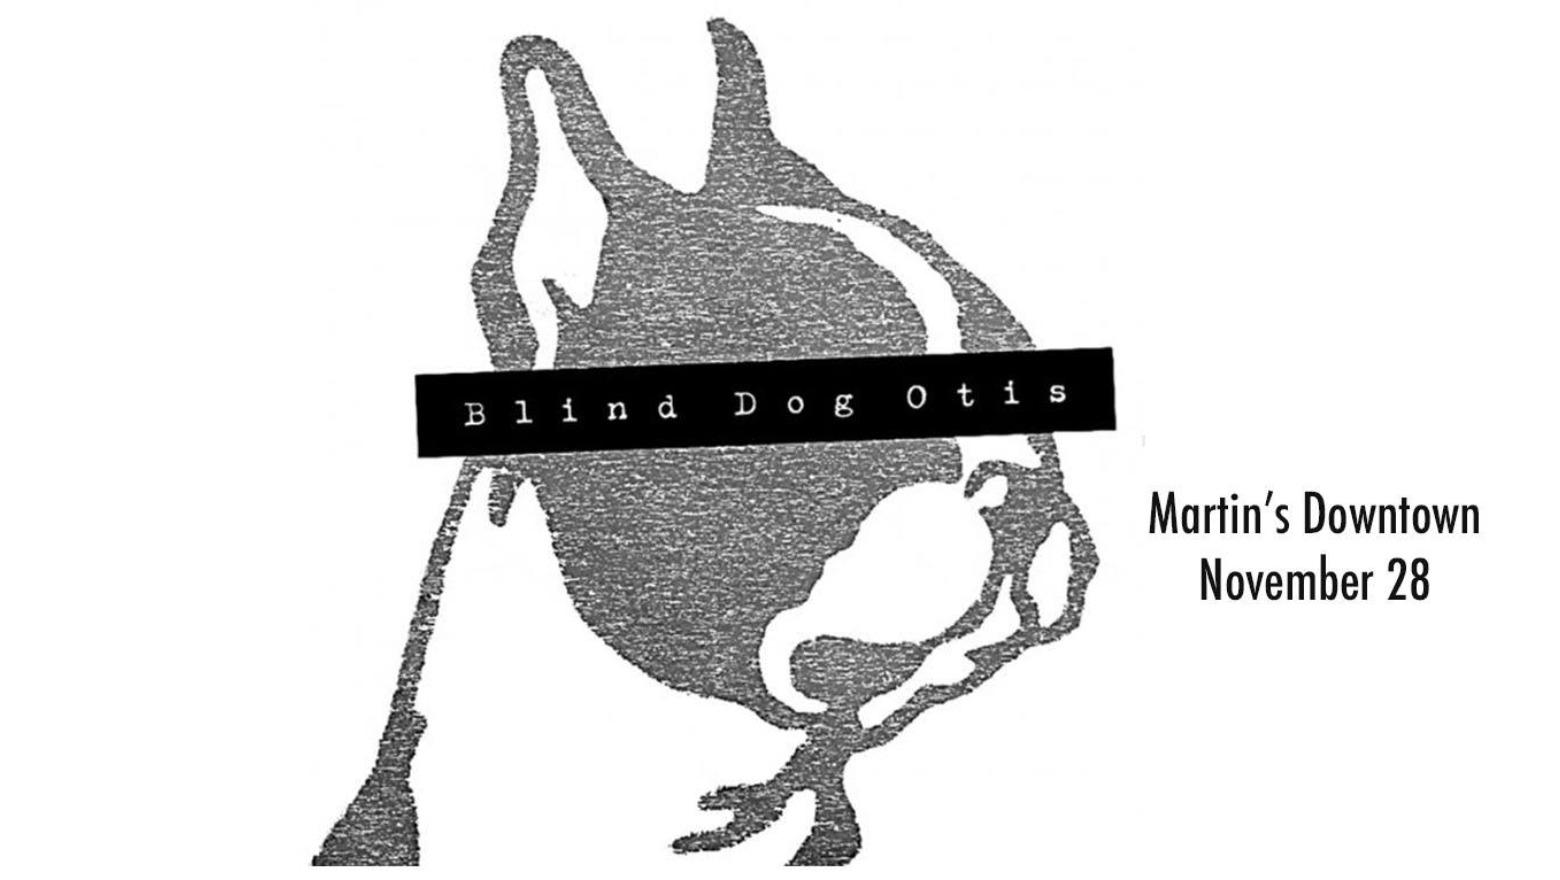 Blind Dog Otis at Martins Downtown